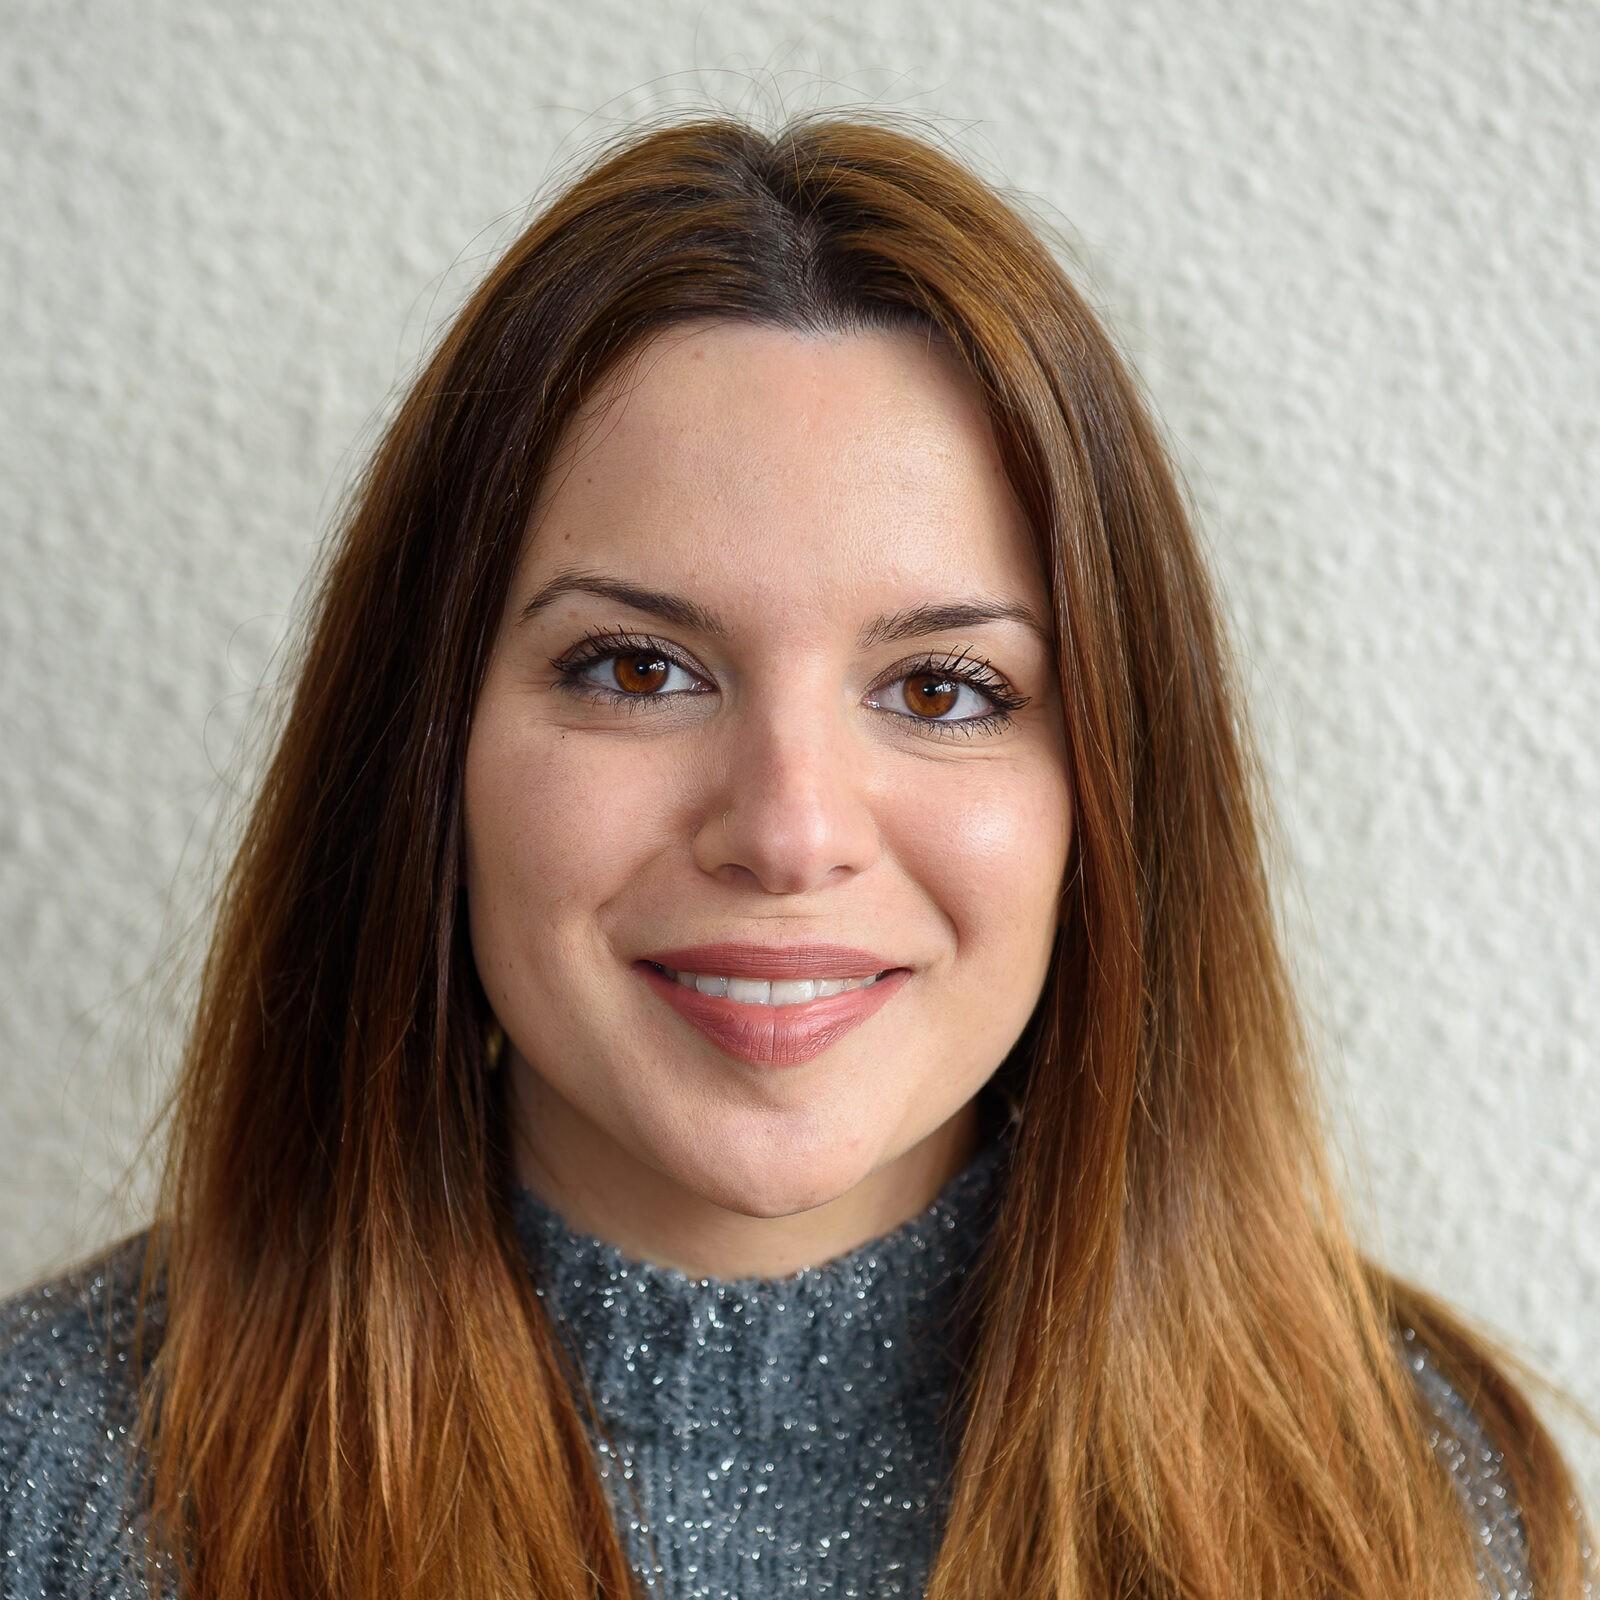 Irene Garrido Ciruela